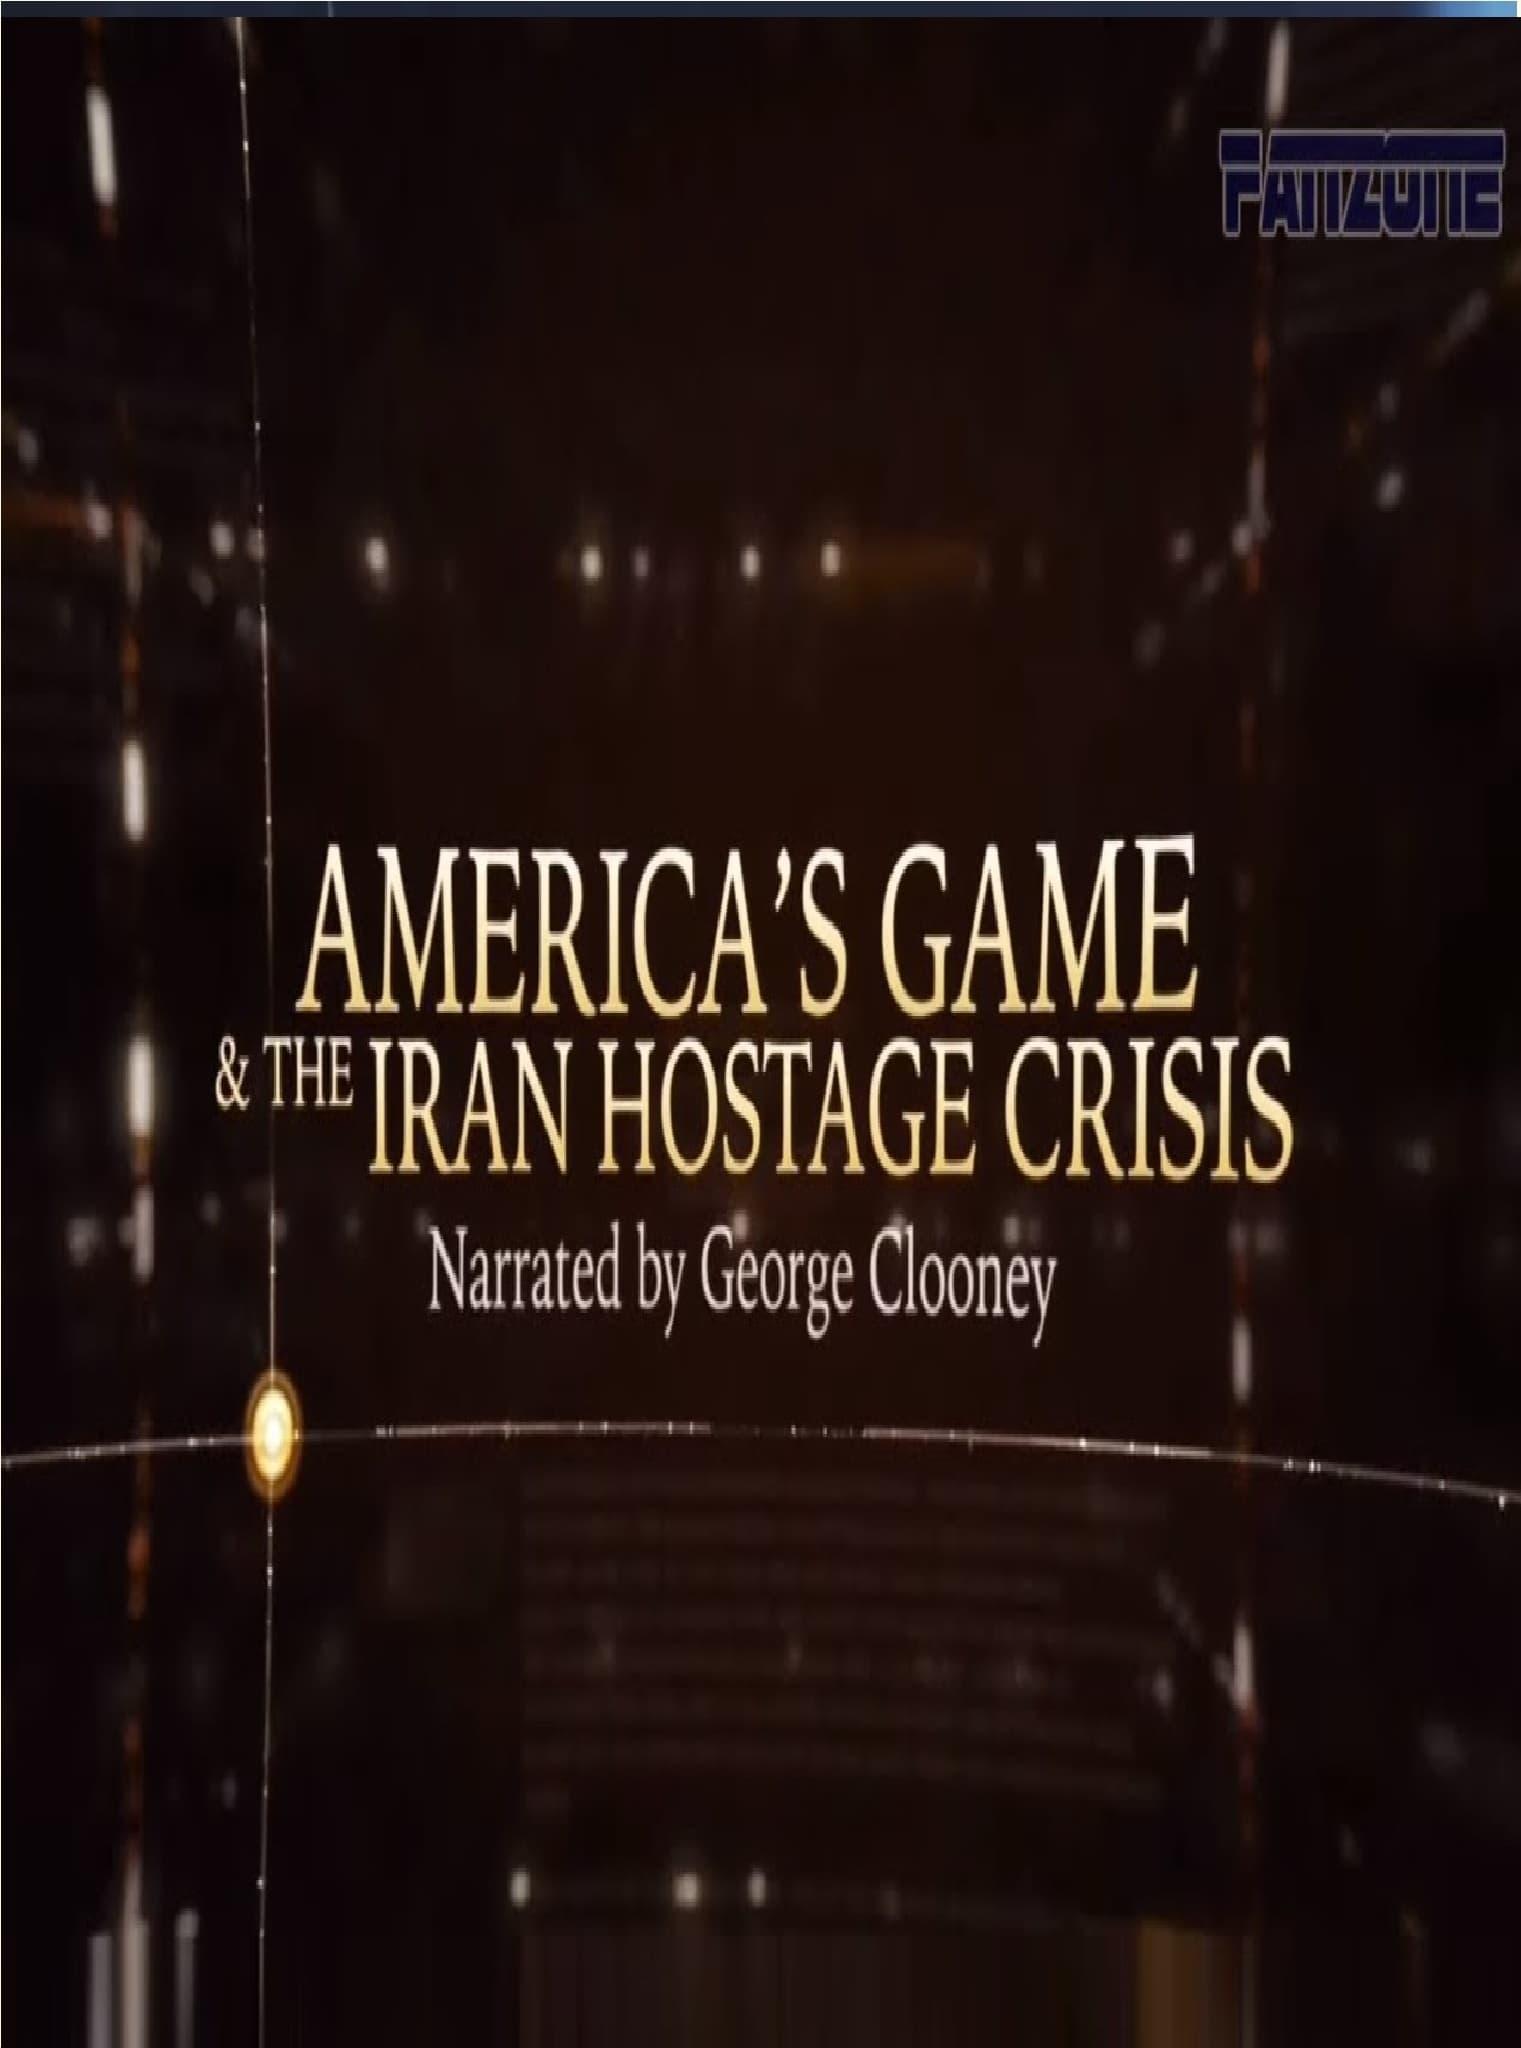 America's Game & The Iran Hostage Crisis